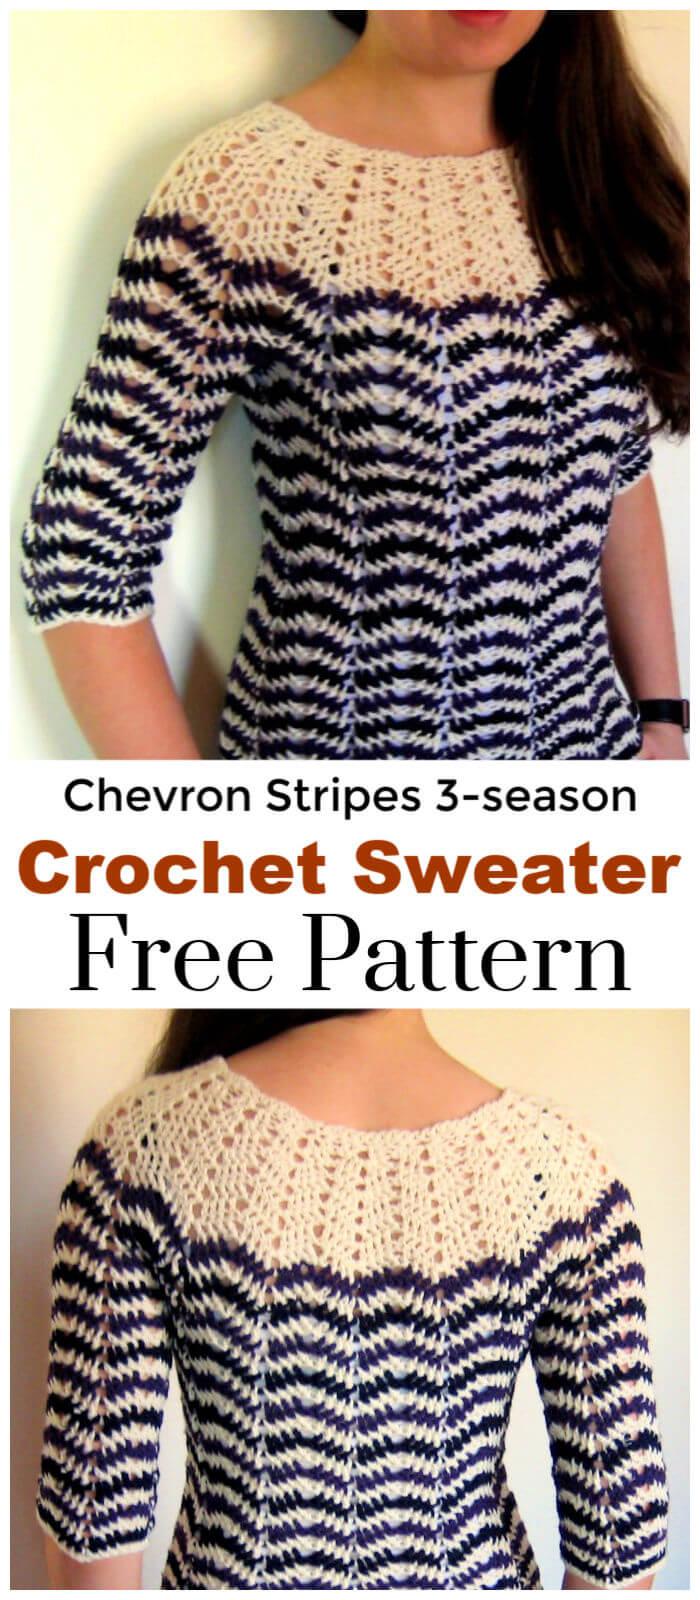 Chevron Stripes 3 season Sweater Free Crochet Pattern